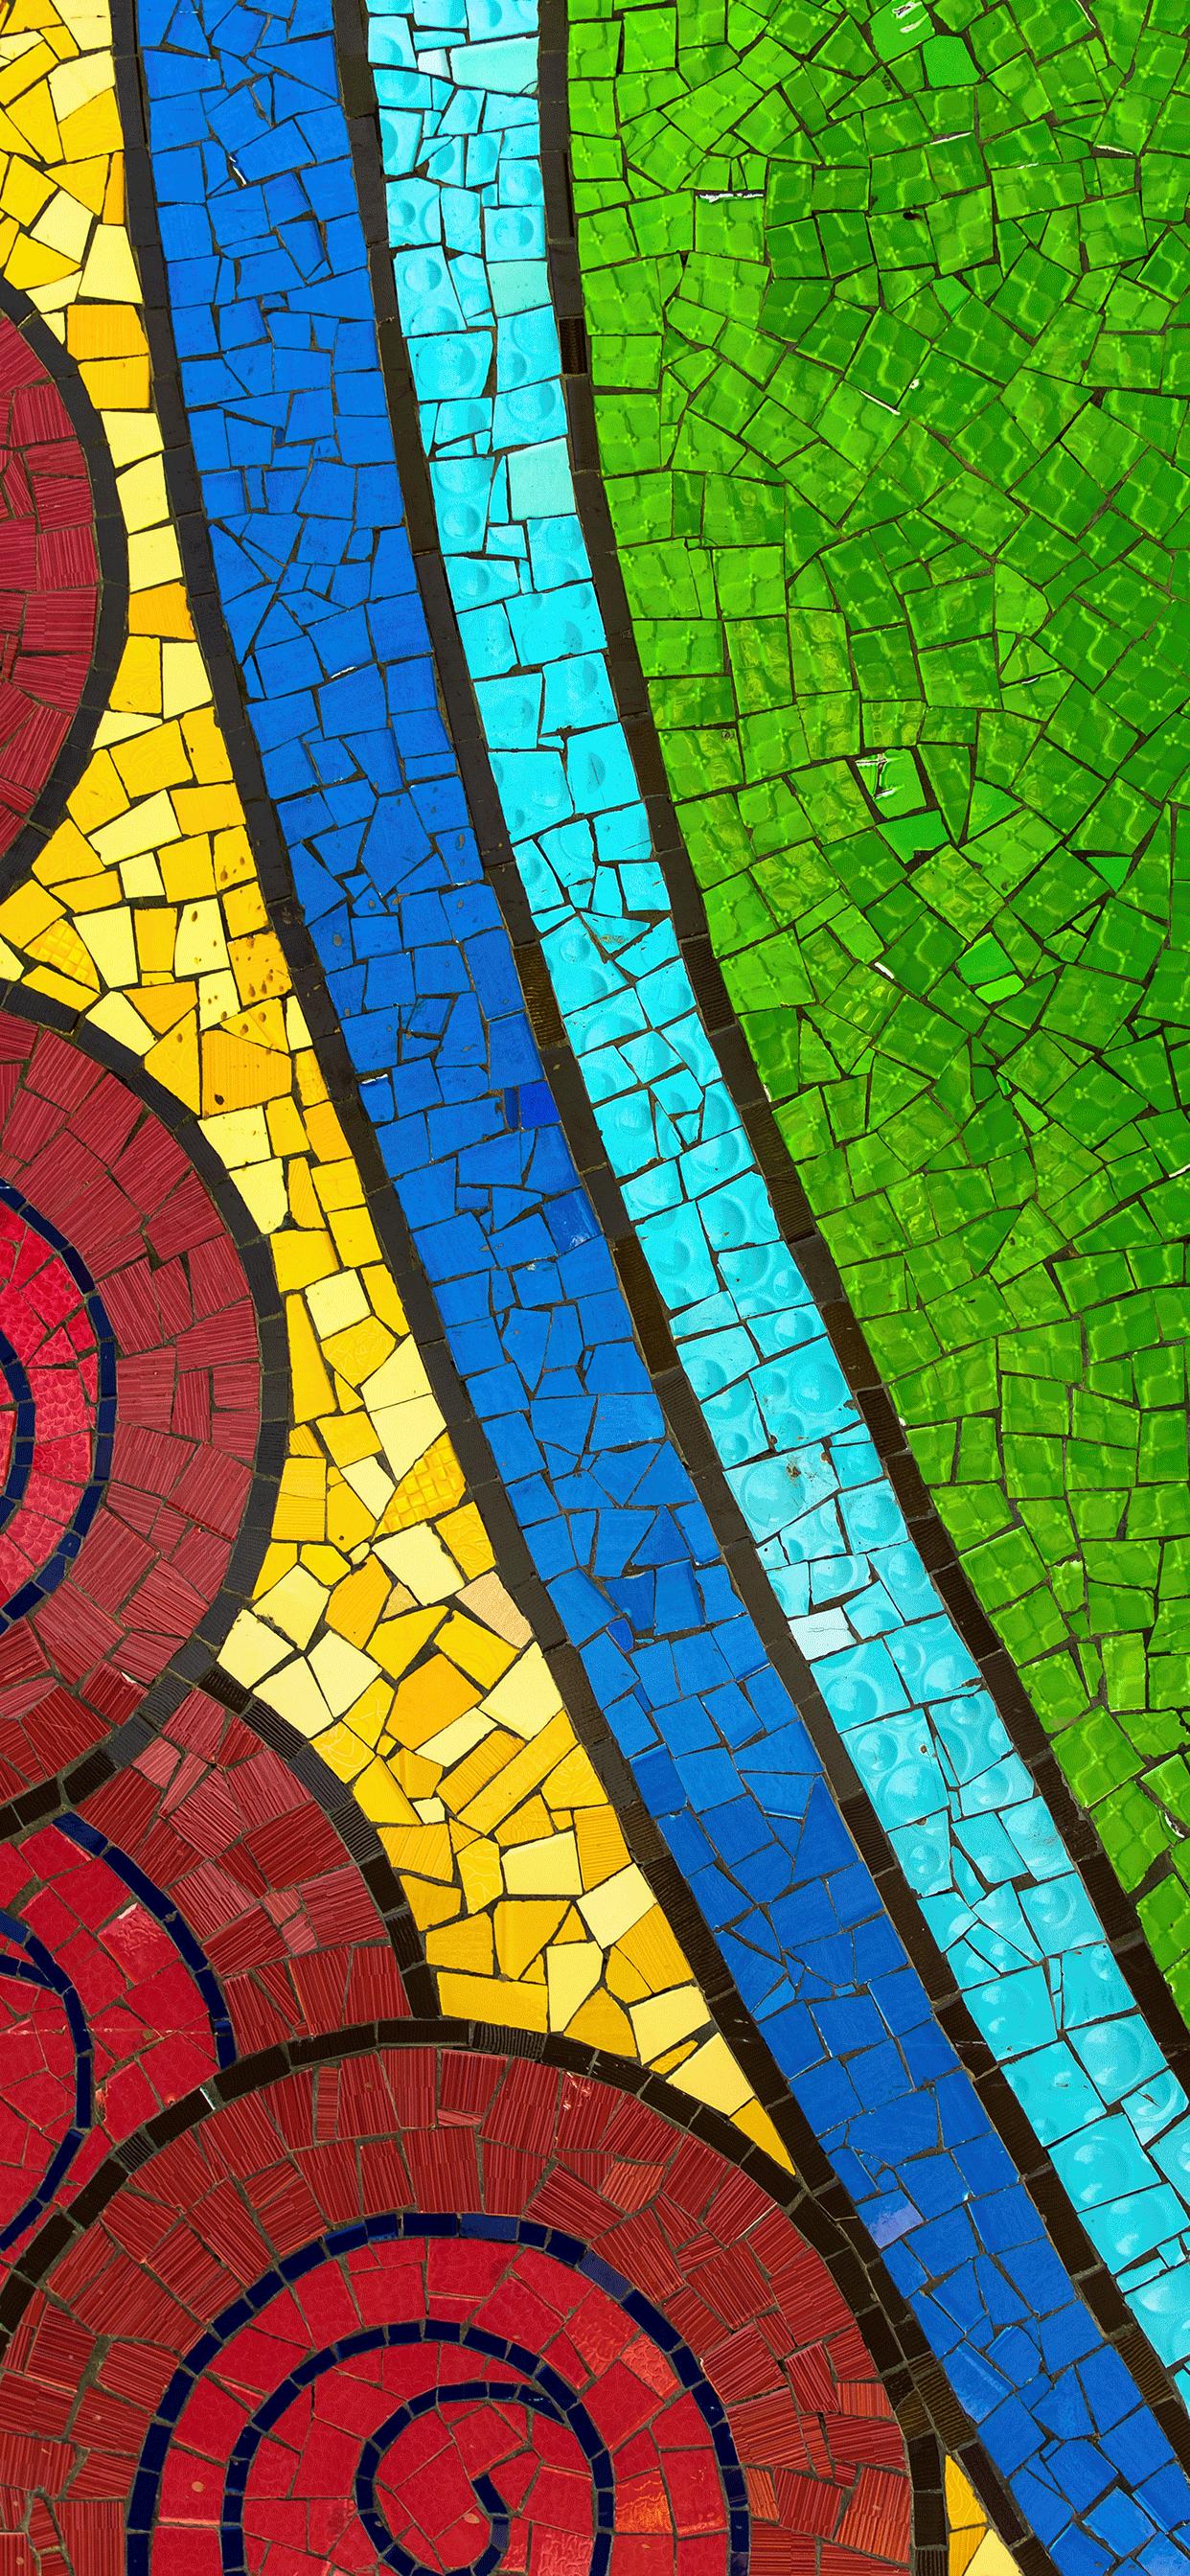 iPhone wallpaper mosaic colors Mosaic